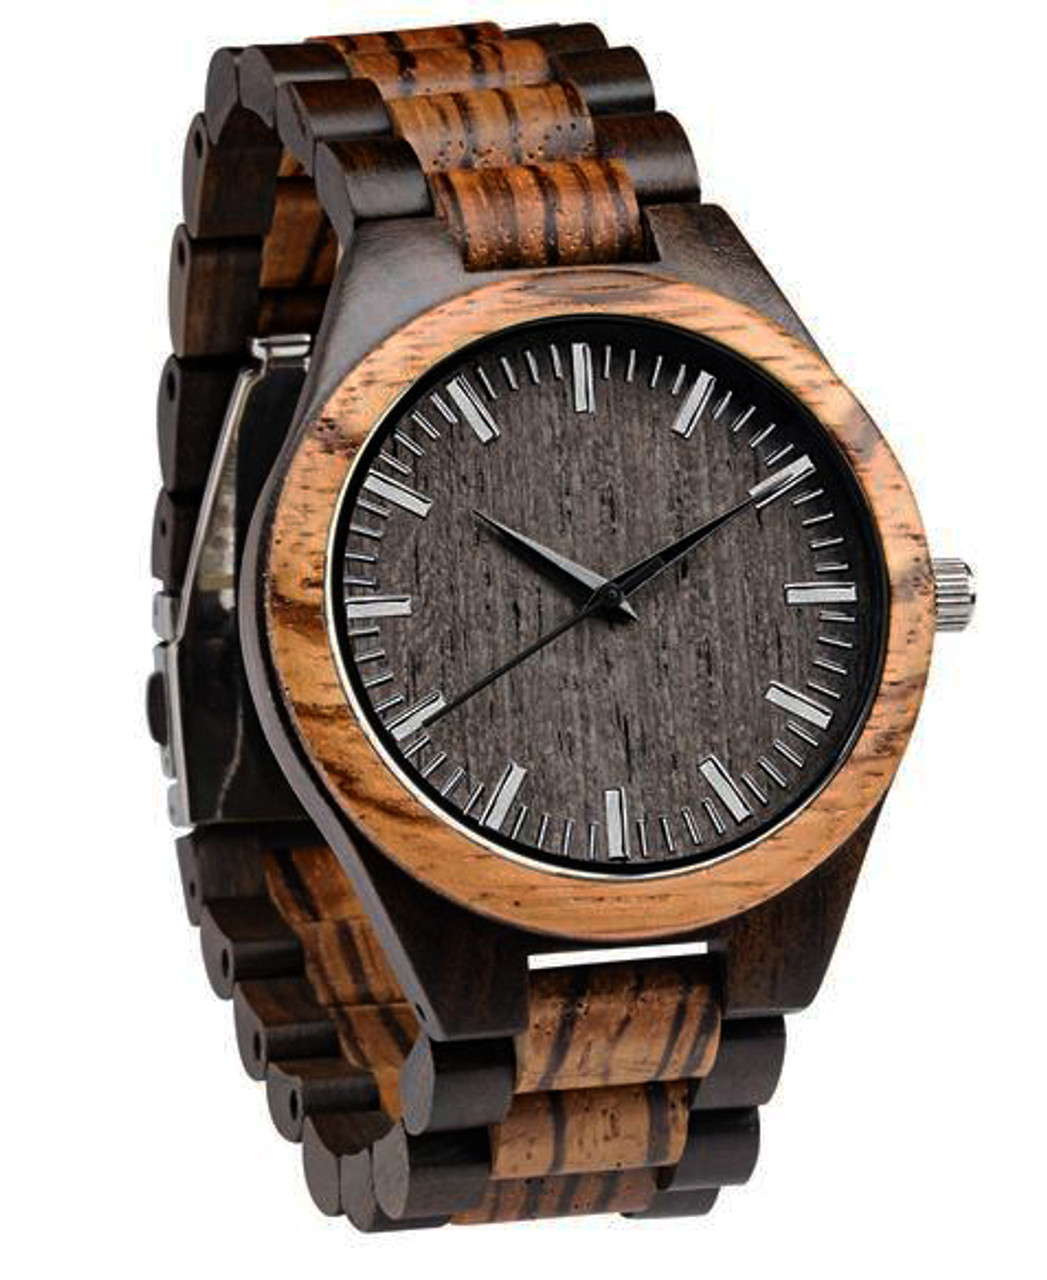 Grpn - Engraved  Watch W#73